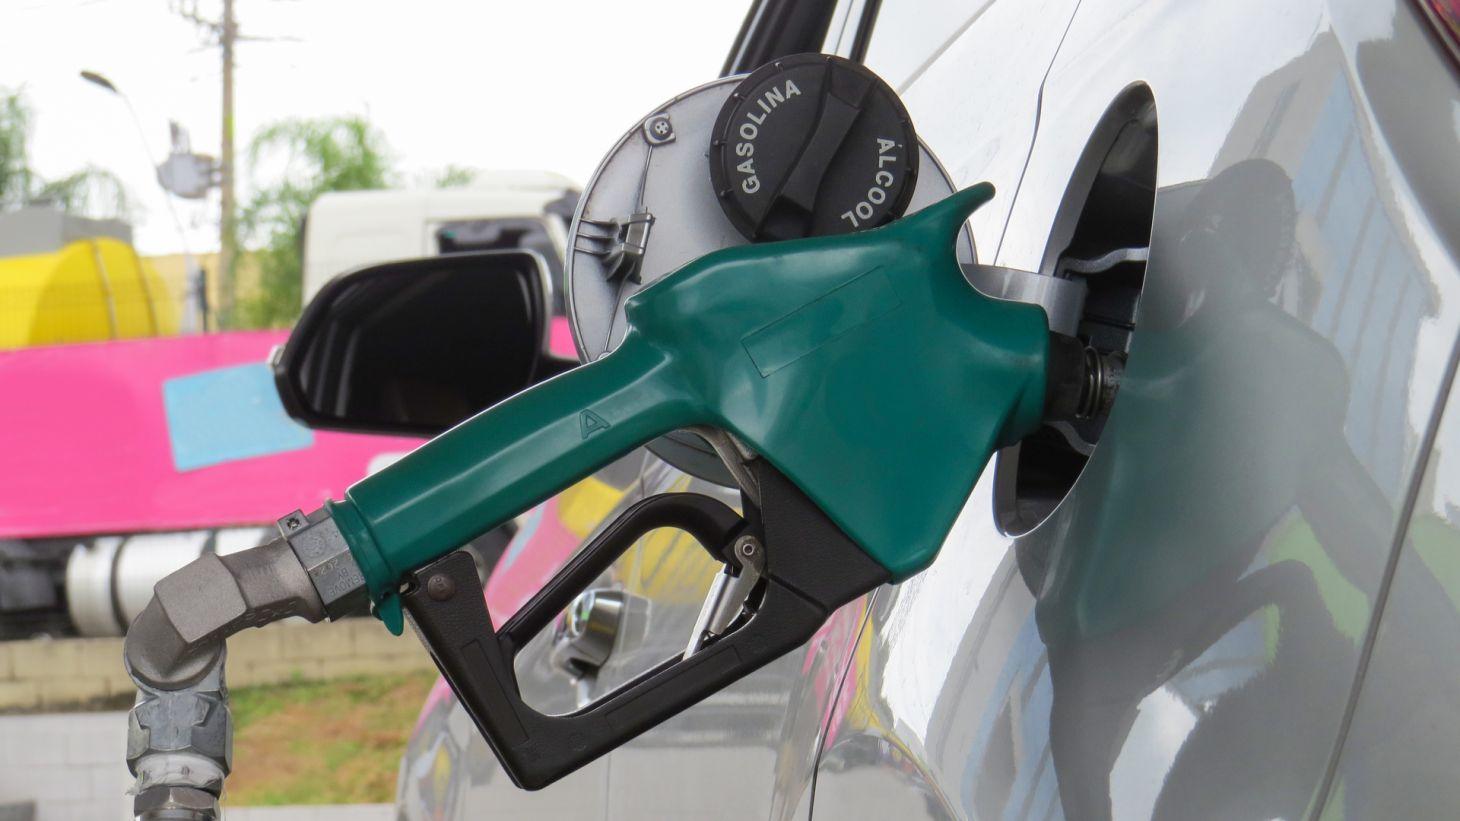 mangueira bocal abastecendo carro flex posto combustivel